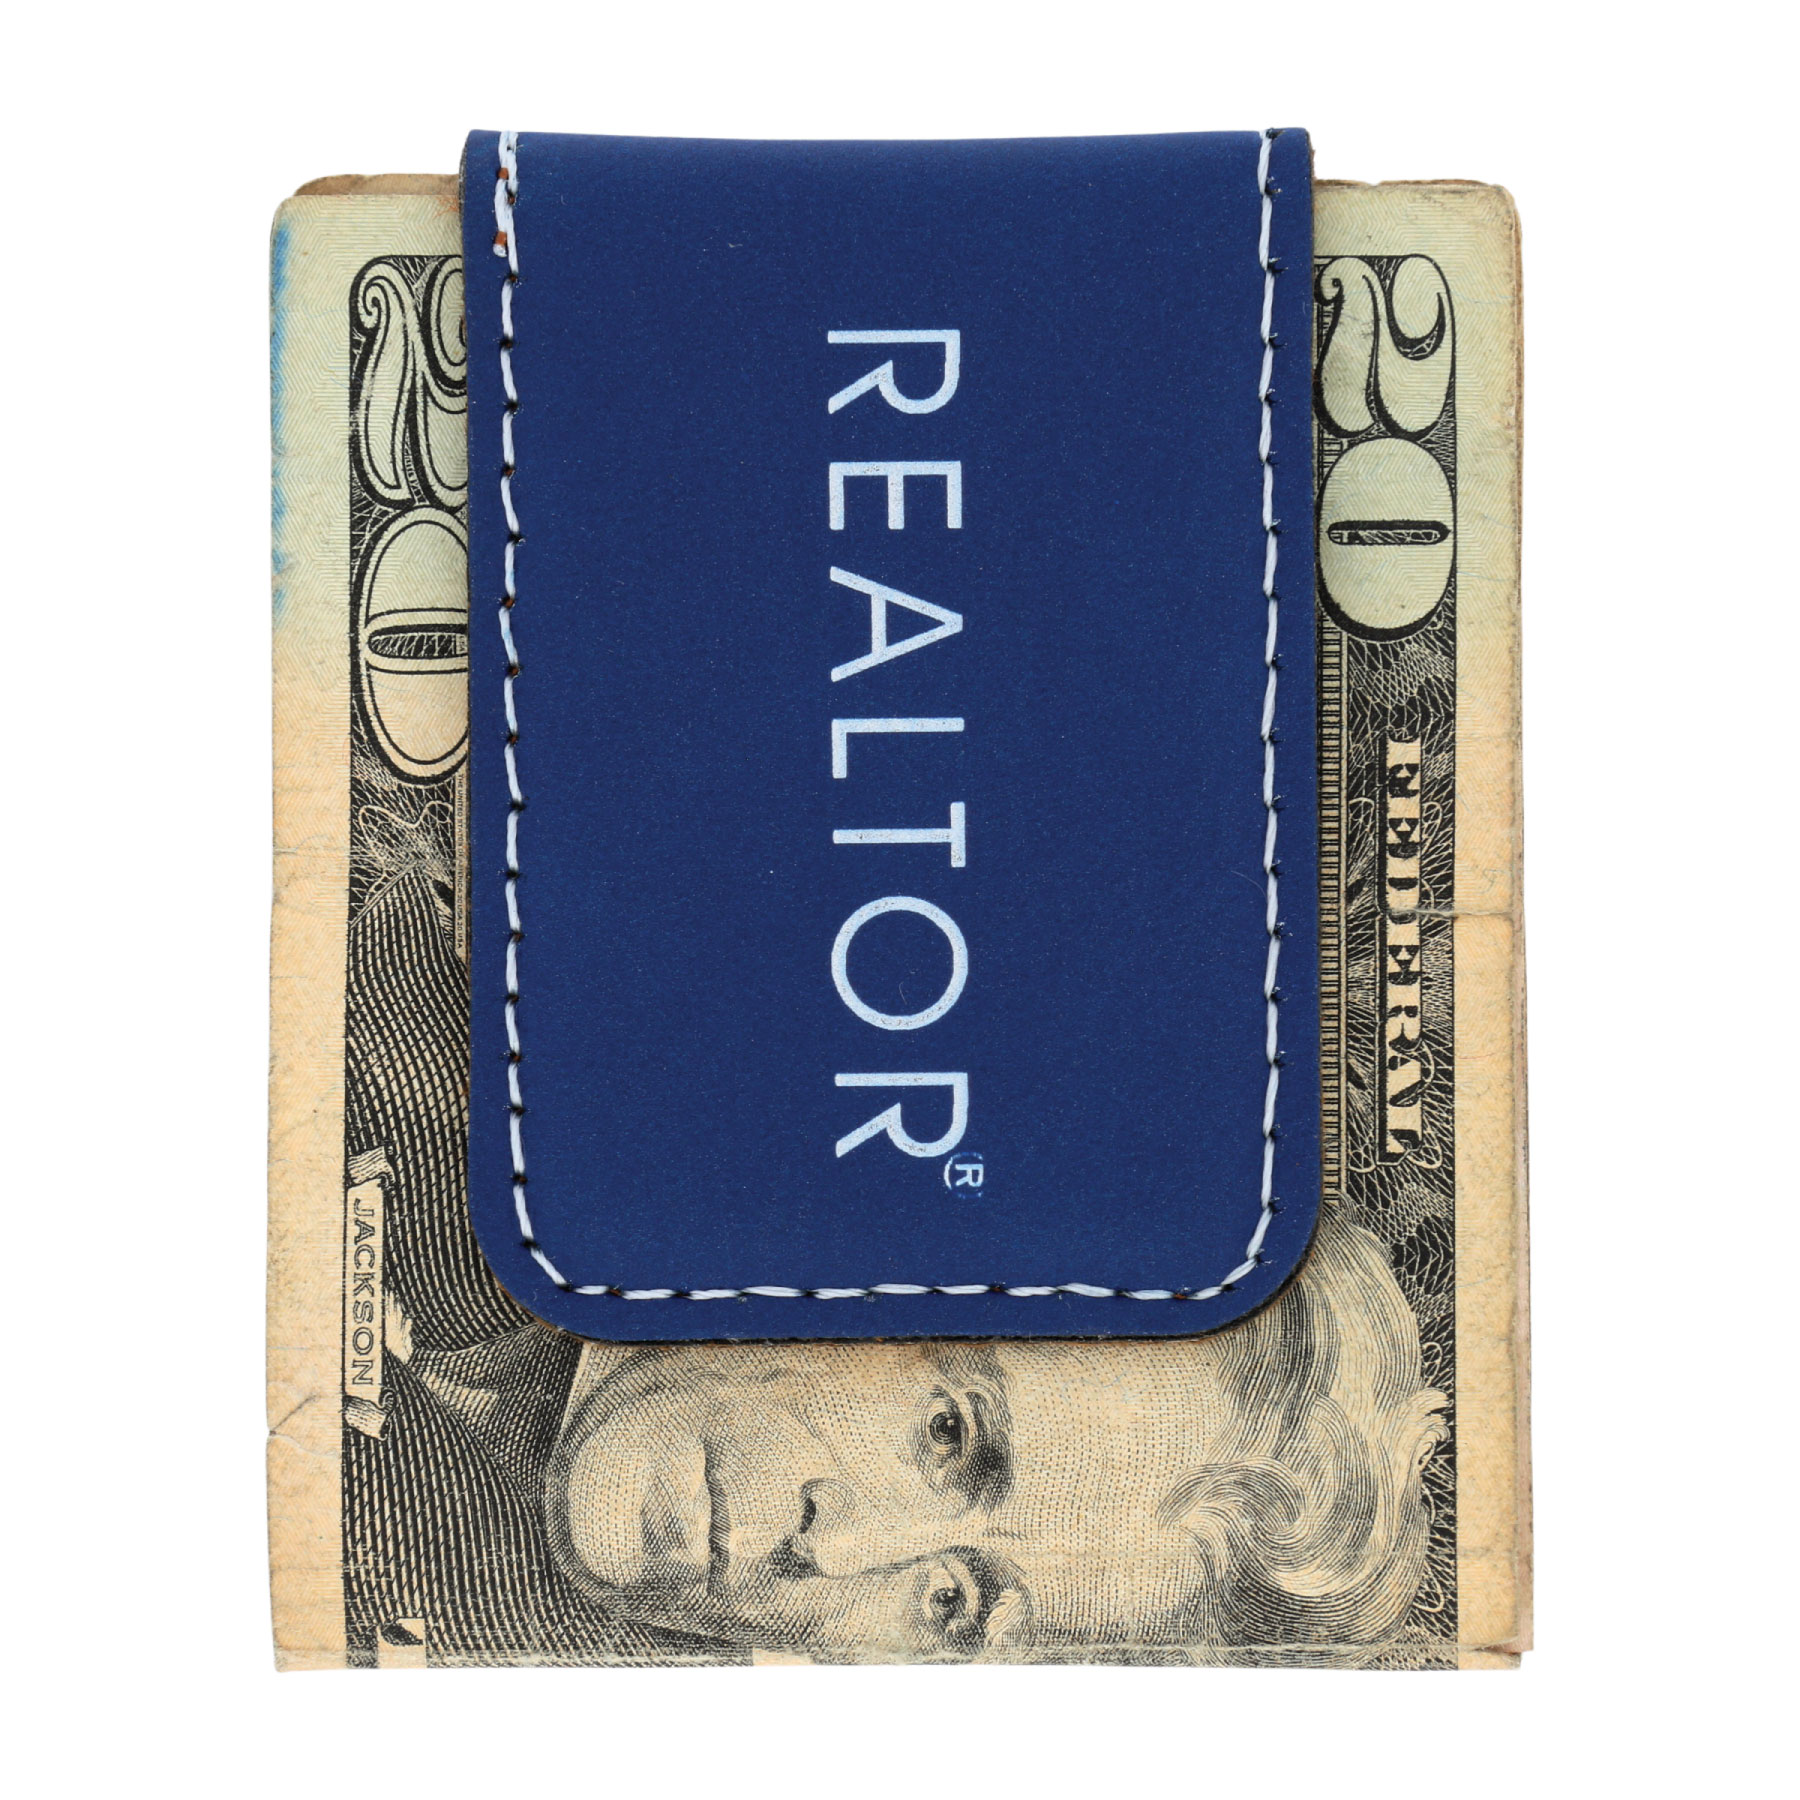 Normandy Money Clip Clips,Dollars,Moneys,Moneyes,Cash,Wads,Wallets